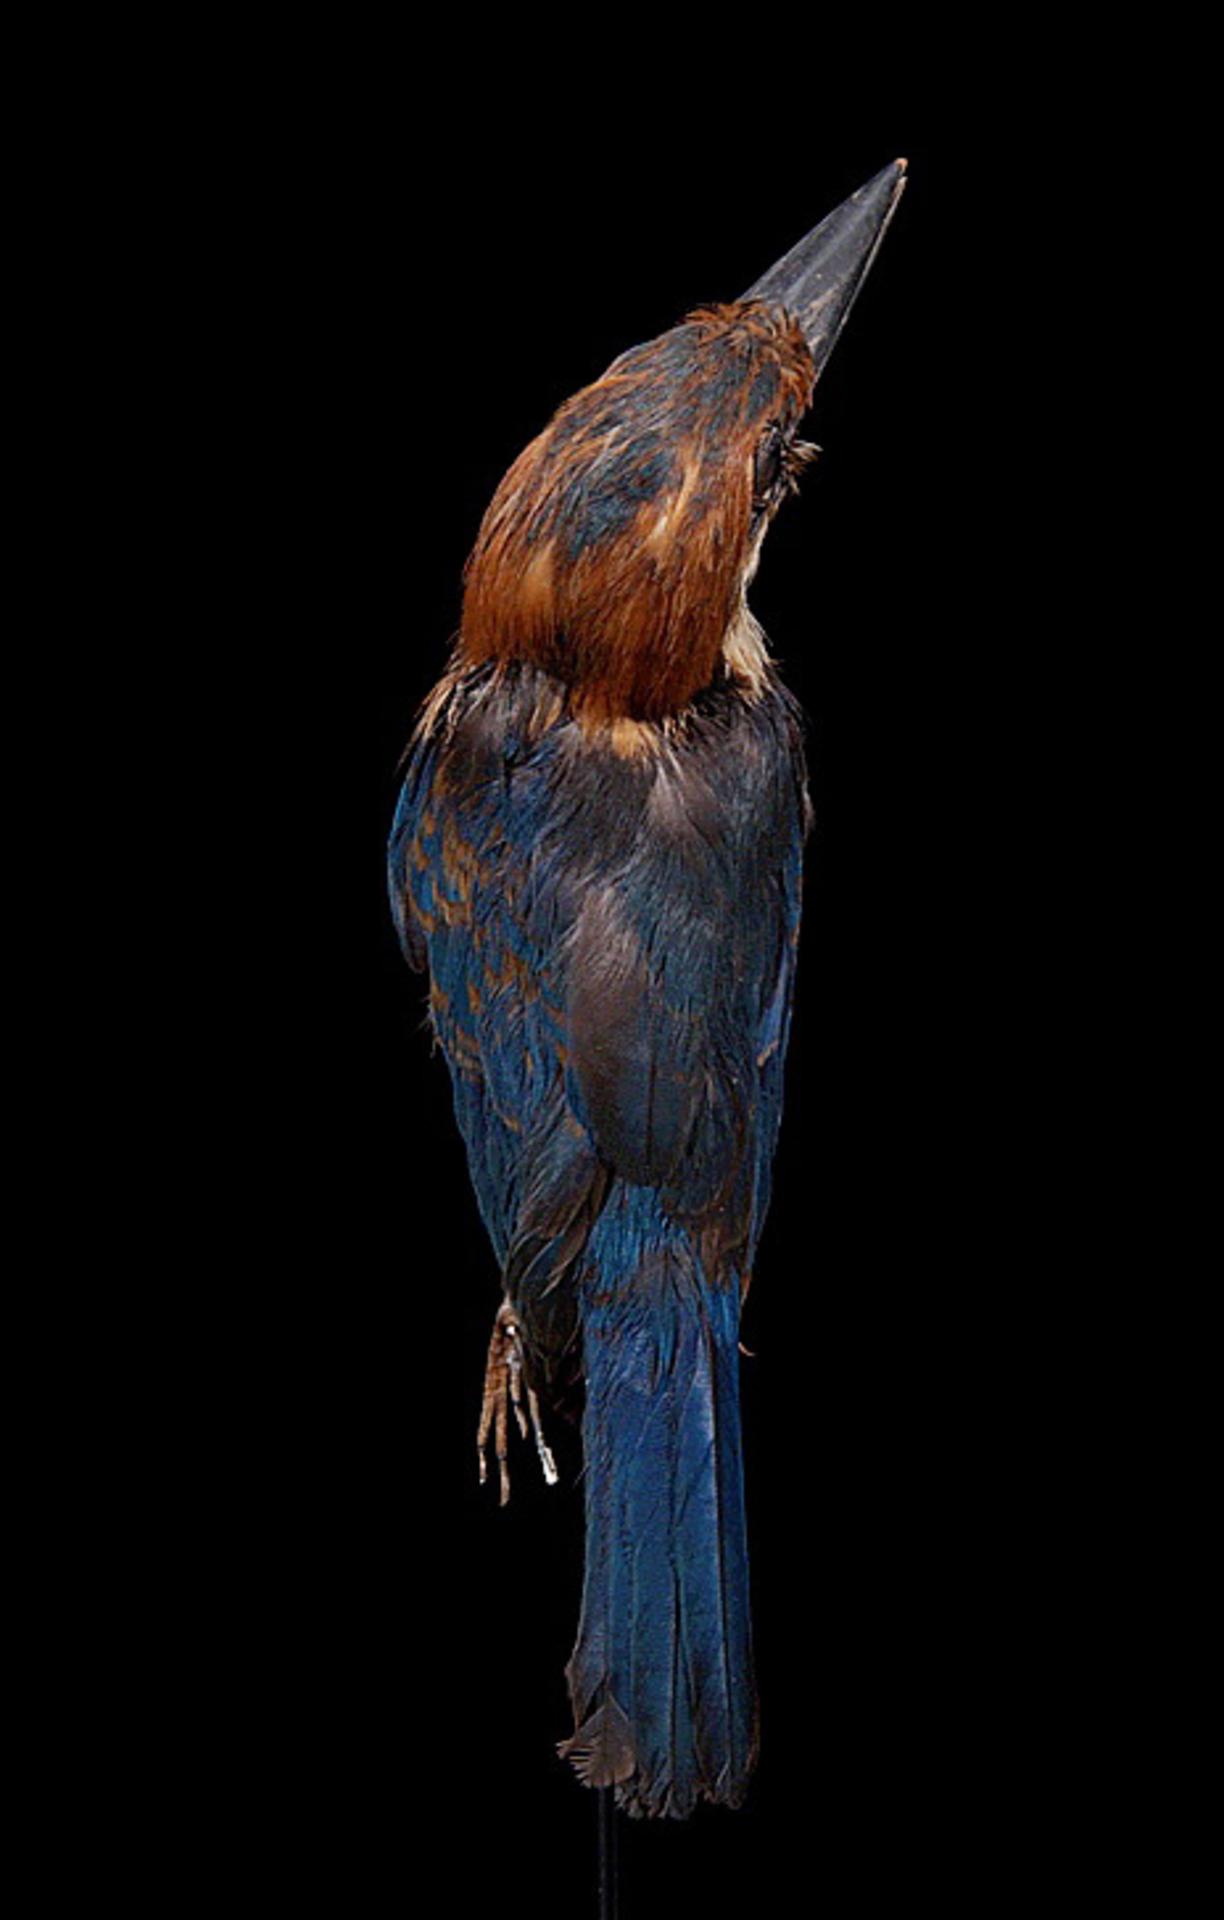 RMNH.AVES.110027 | Todiramphus cinnamominus cinnamominus (Swainson, 1821)